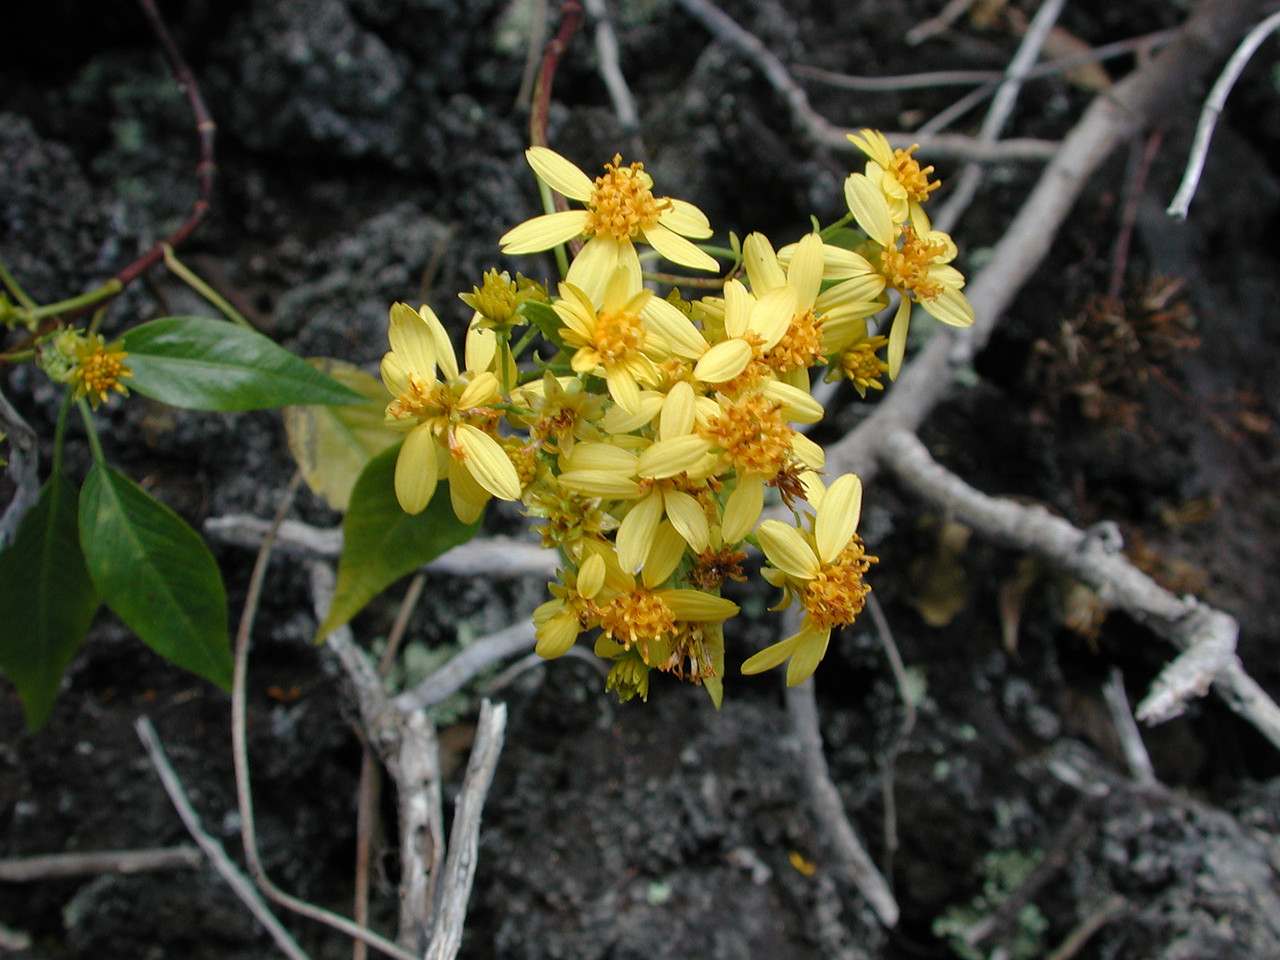 Bidens micrantha subsp. ctenophylla